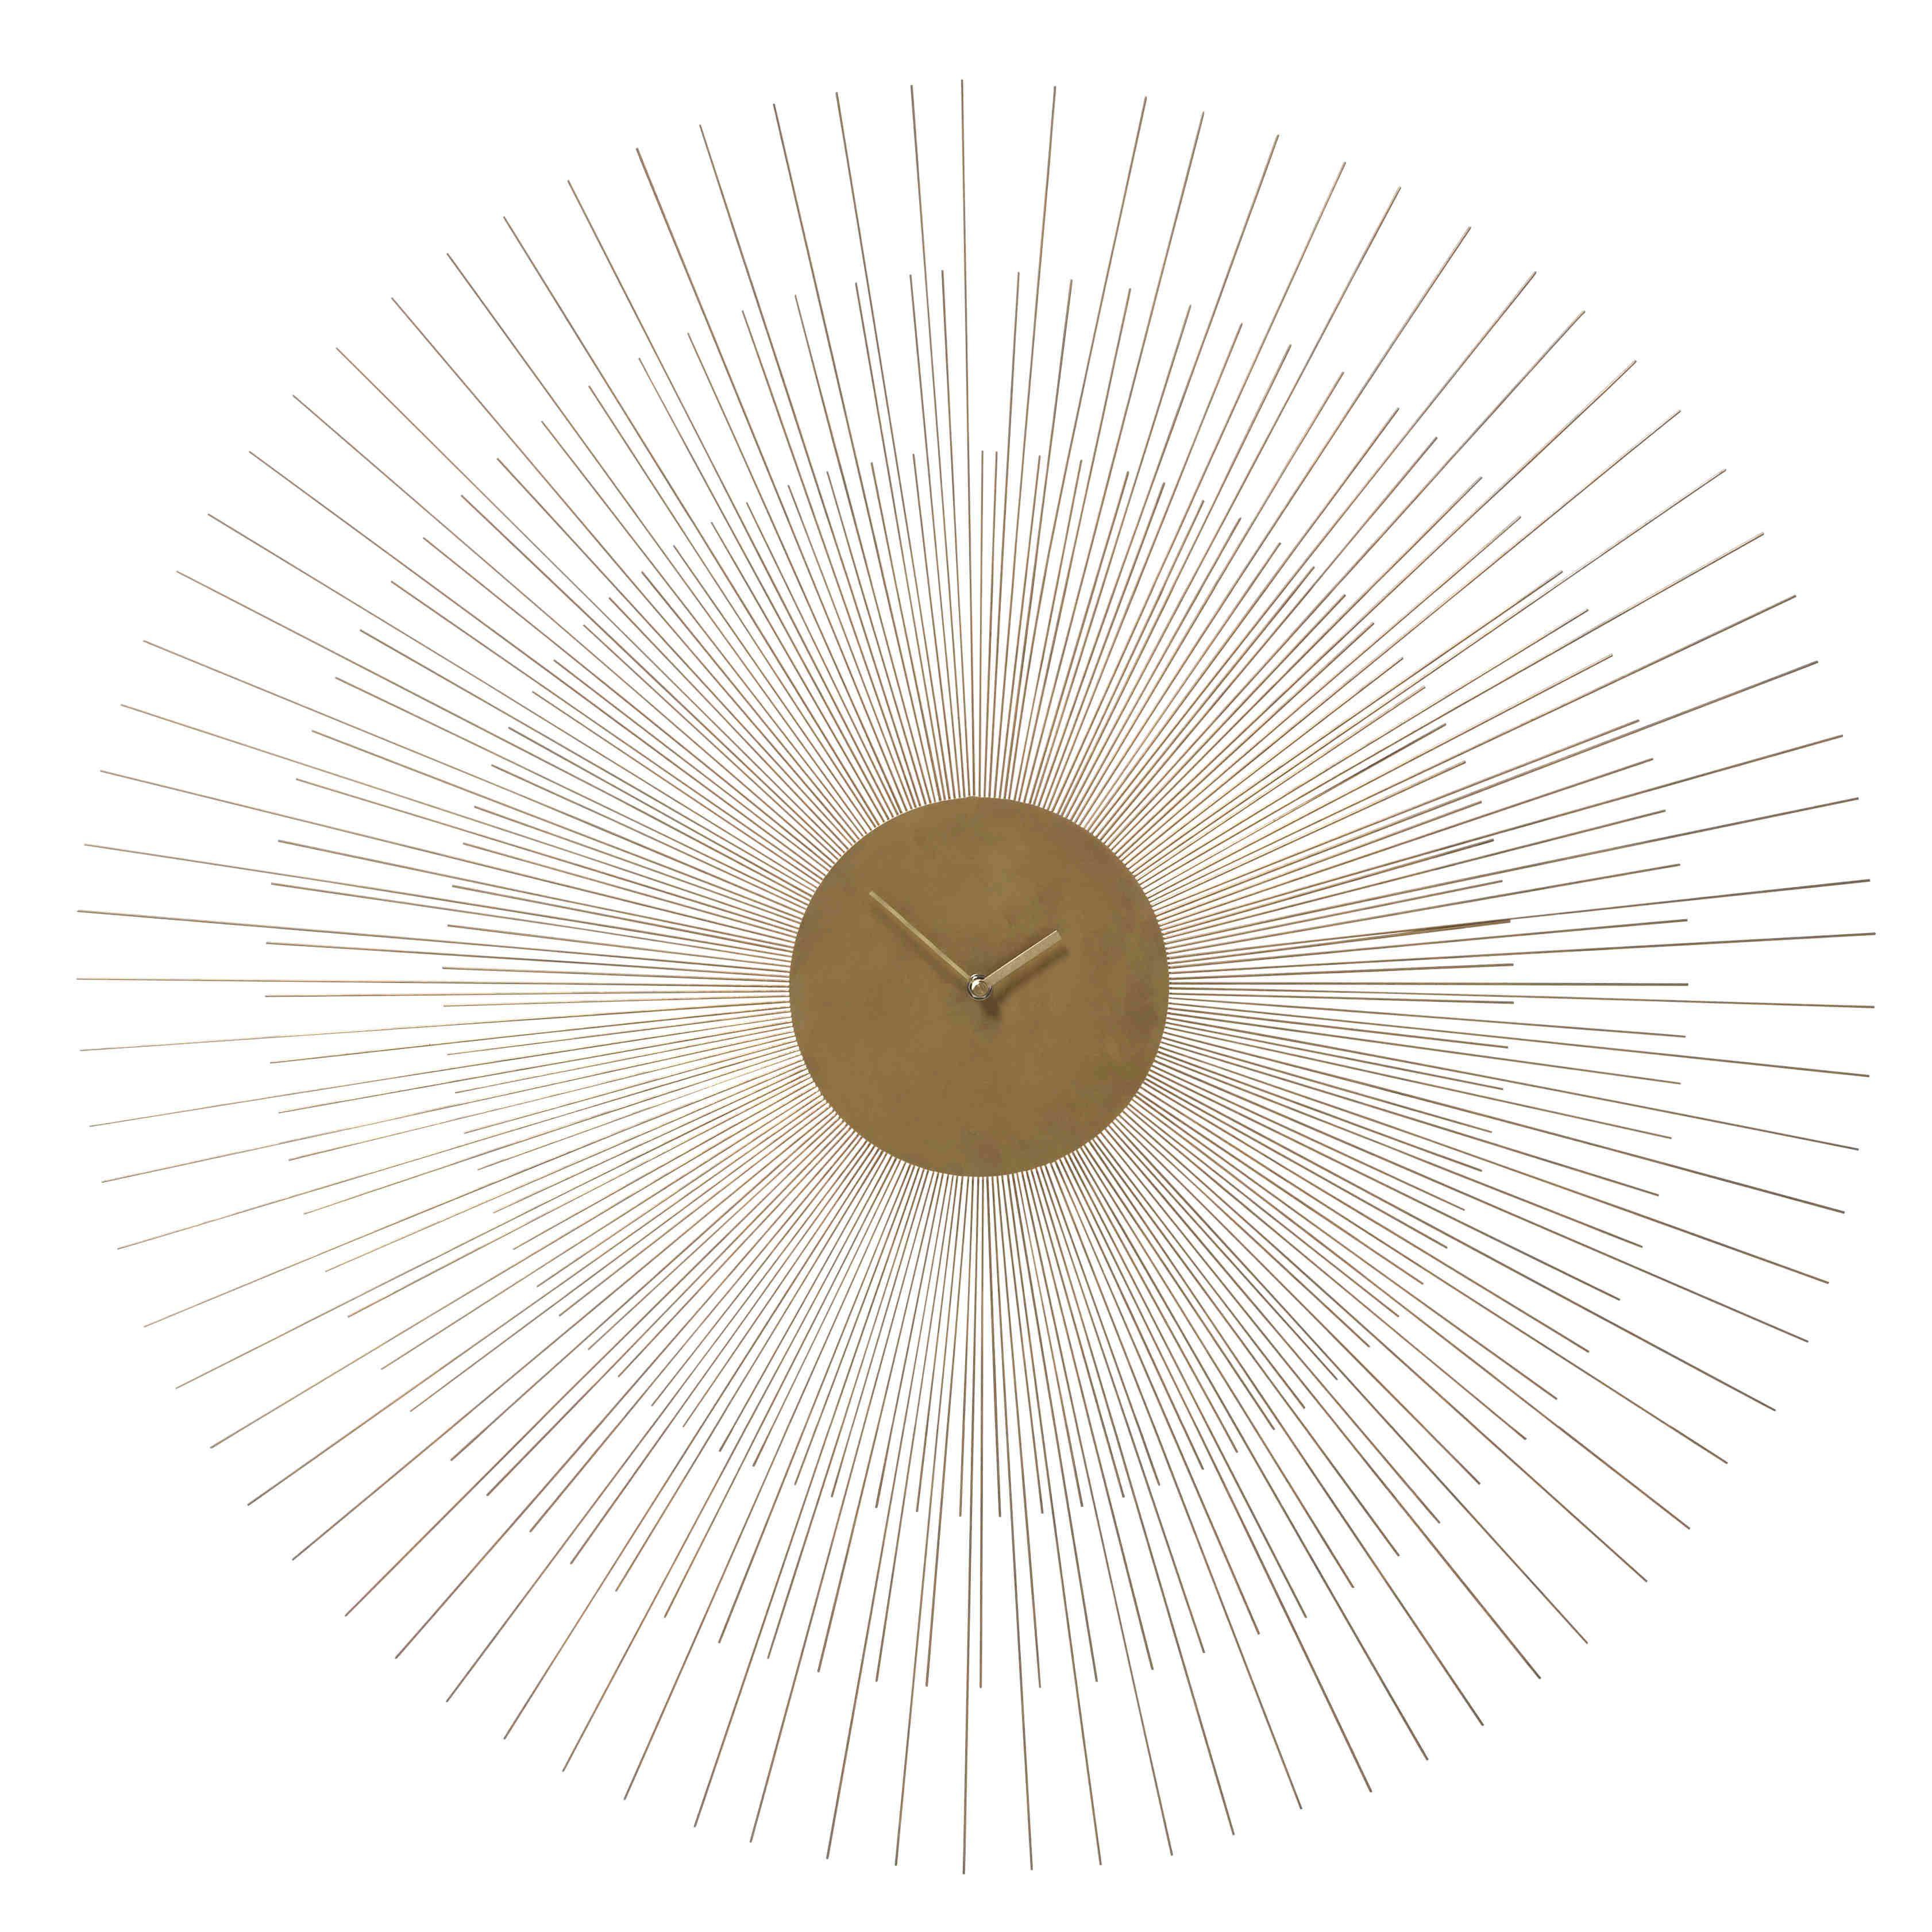 Habitat Wanduhr wanduhr callista aus metall d 95 cm goldfarben jetzt bestellen